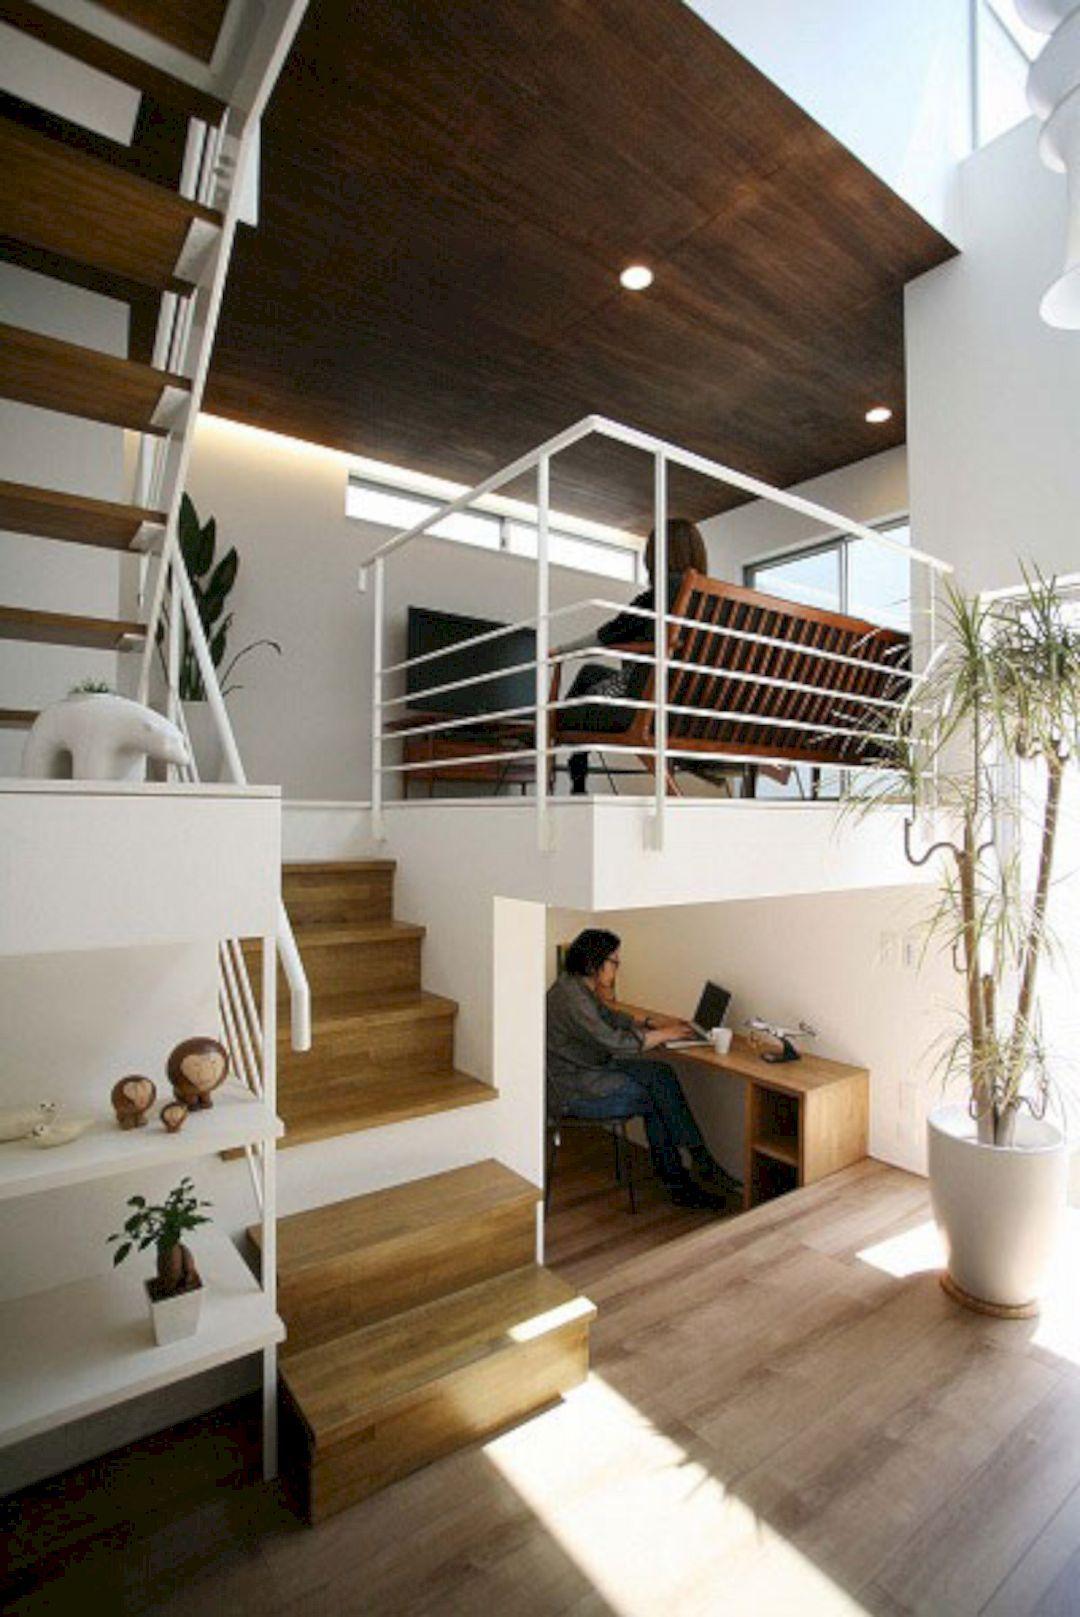 Interior design inspiration modern interior design modern house design interior architecture house